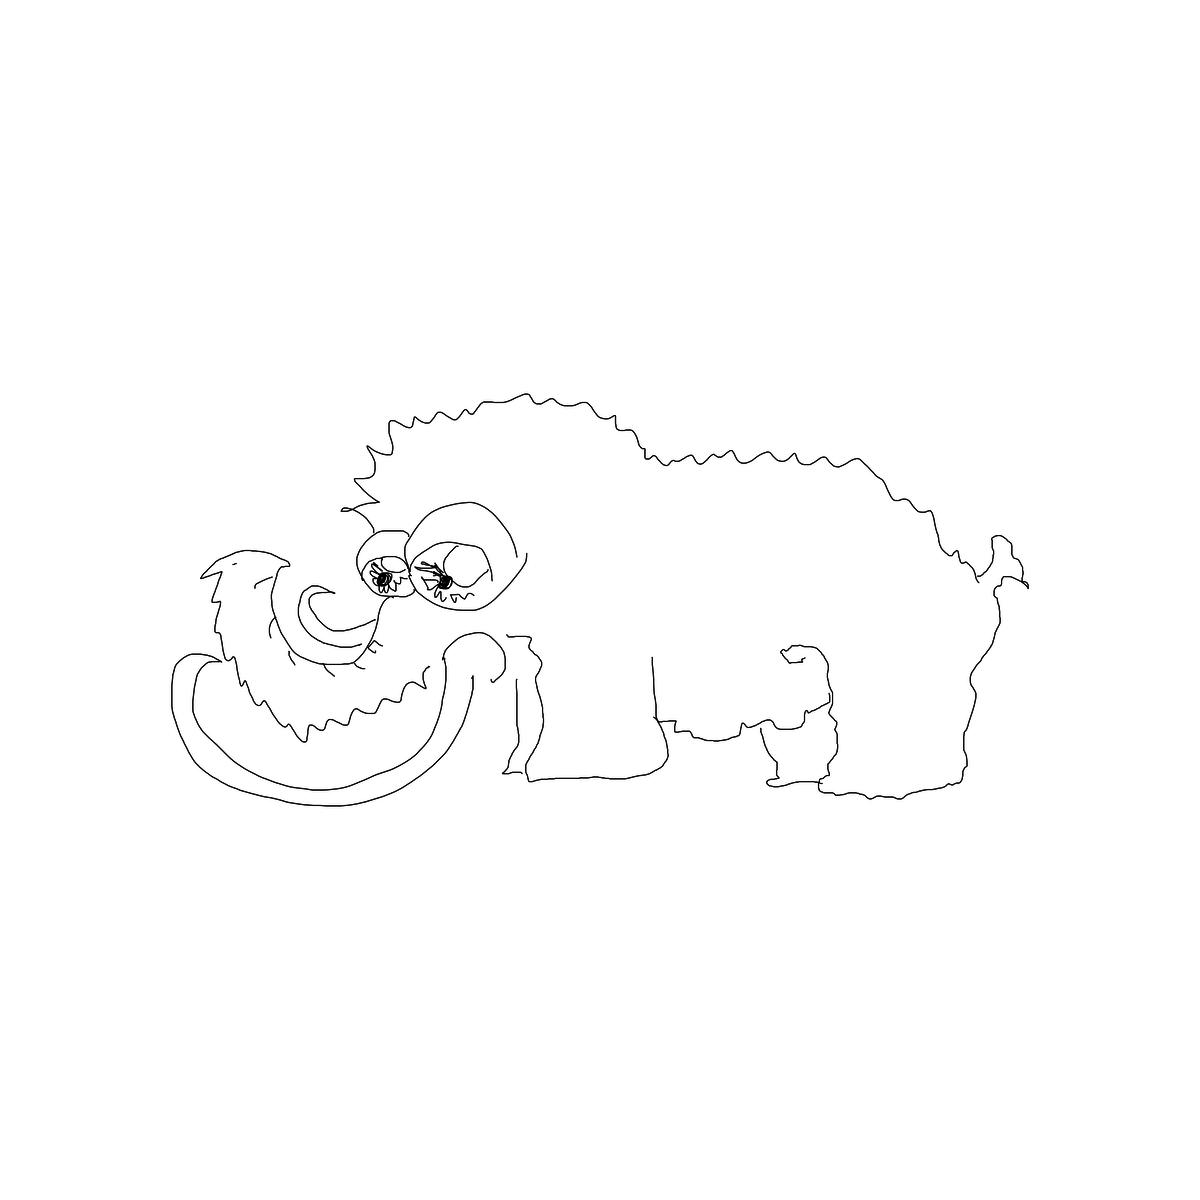 BAAAM drawing#731 lat:47.5086021423339840lng: 19.0262851715087900